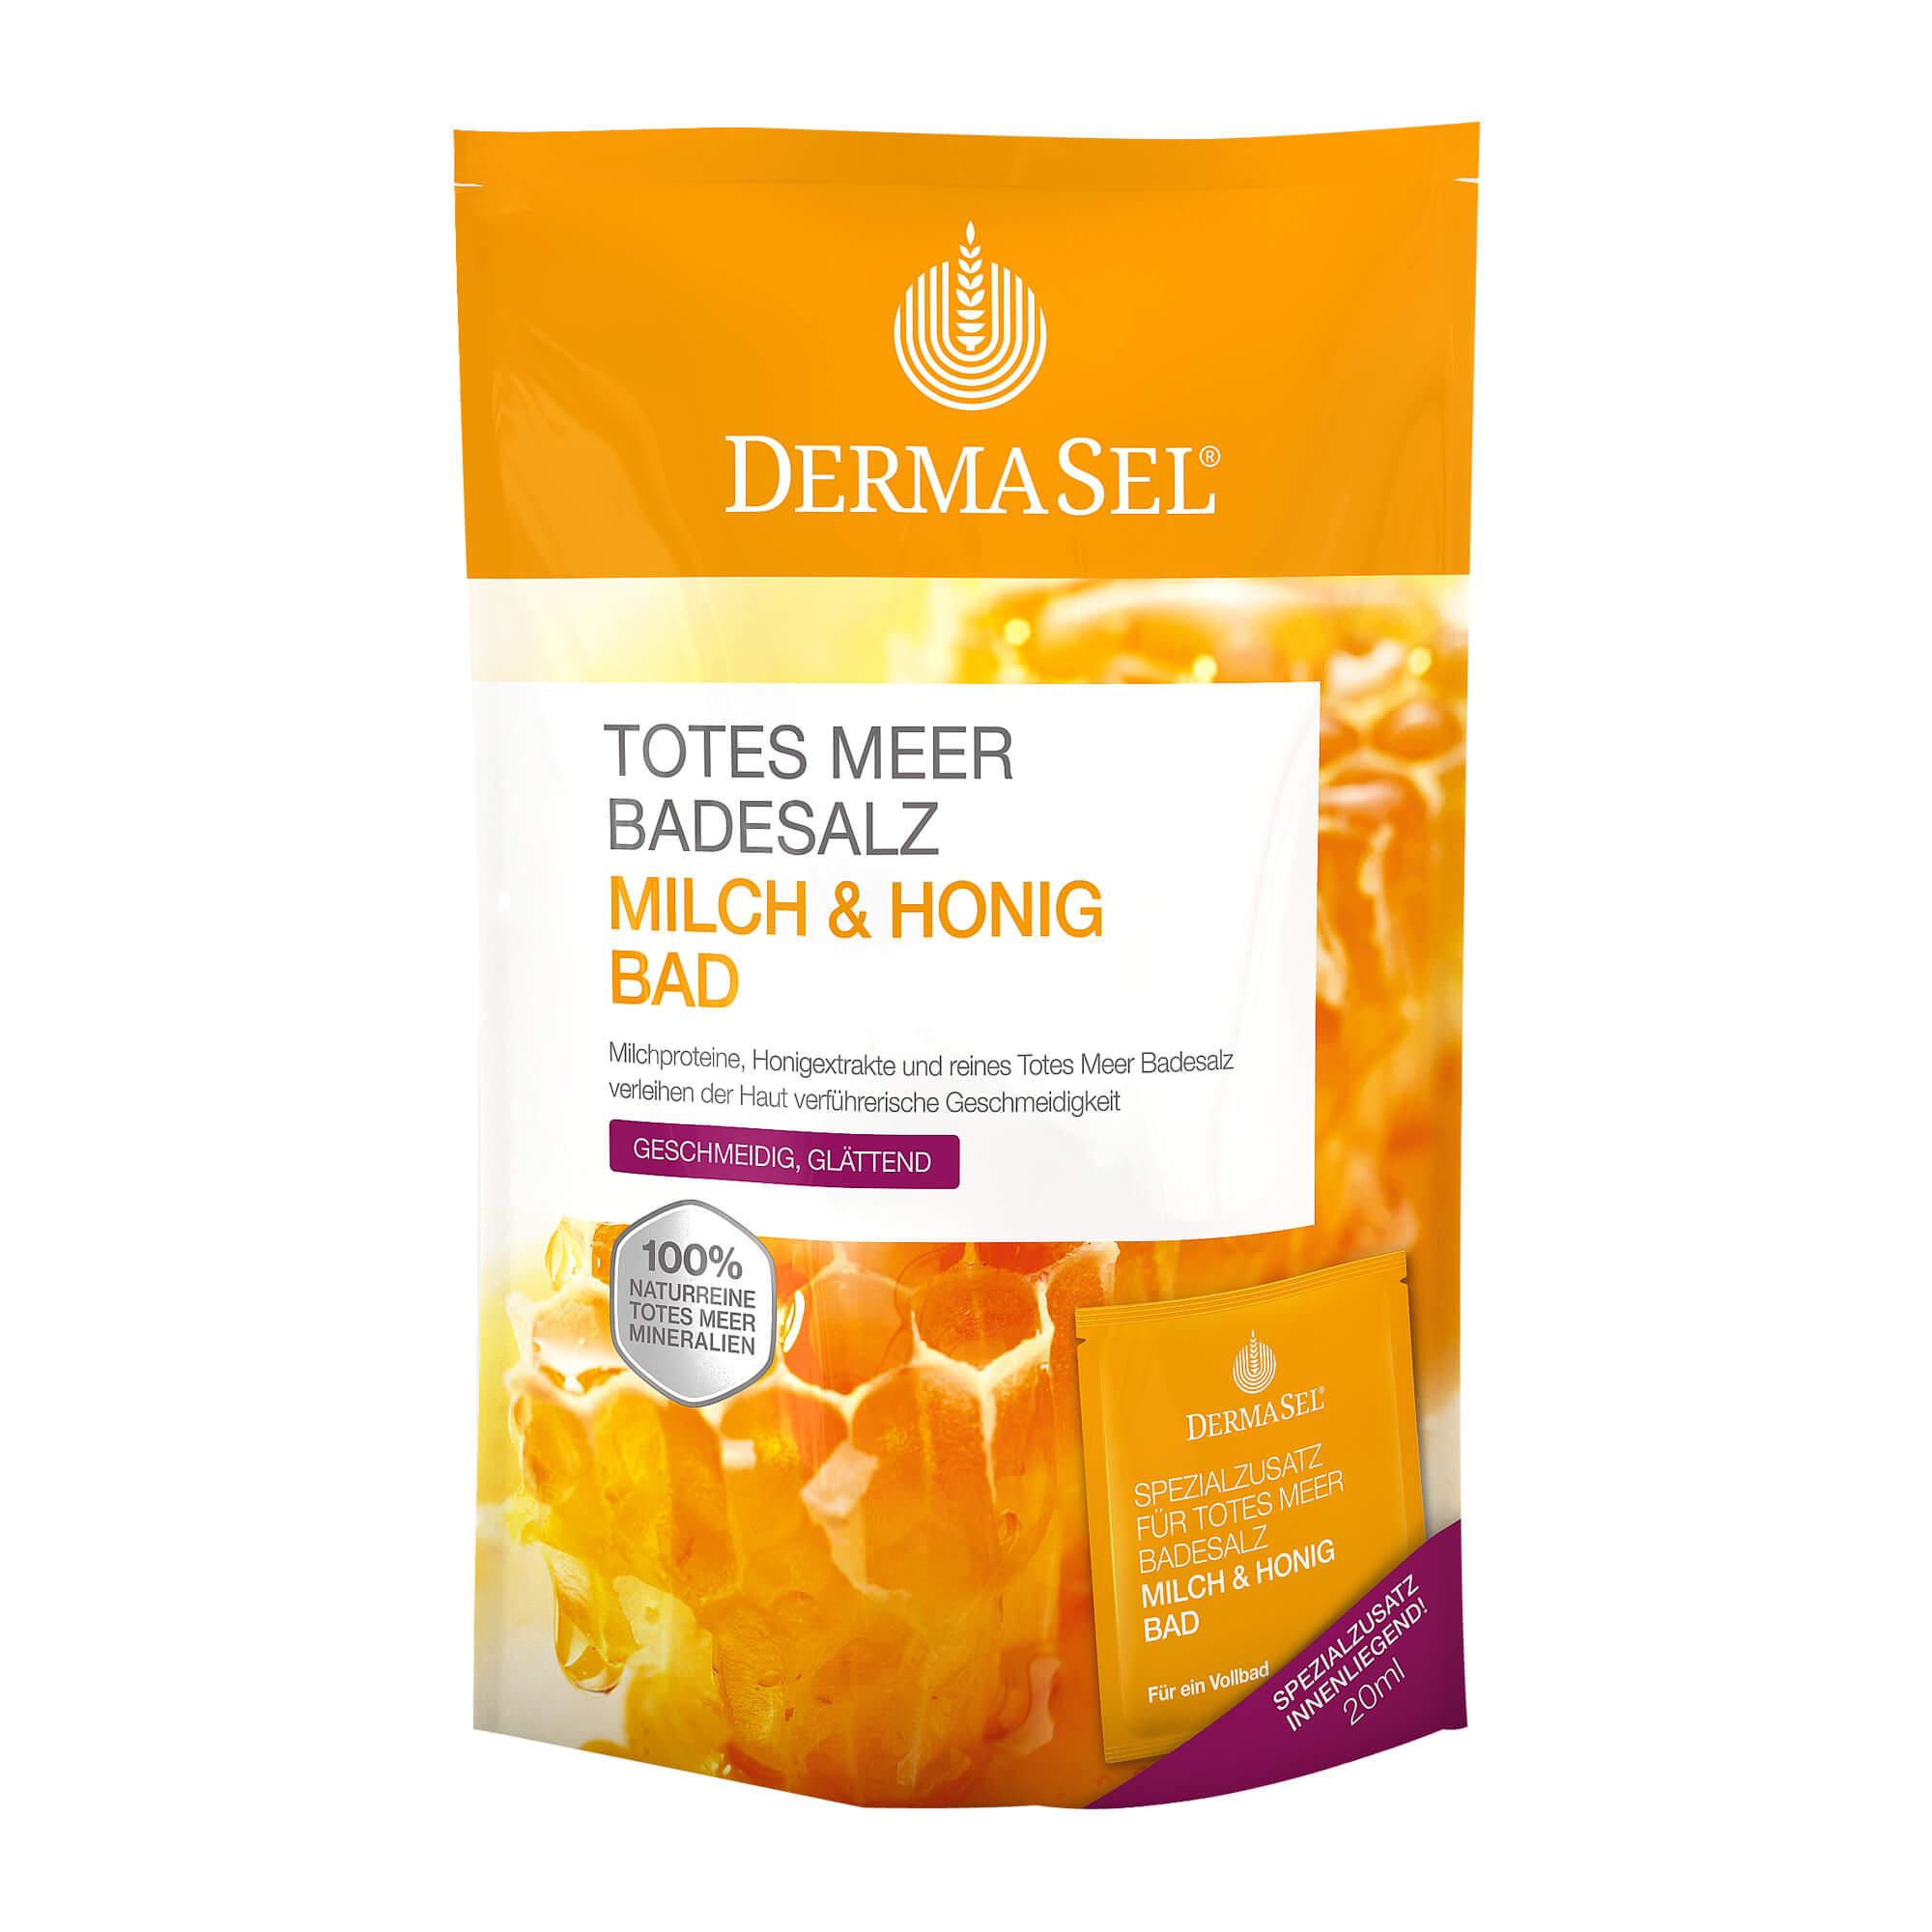 DermaSel Totes Meer Salz Milch & Honig